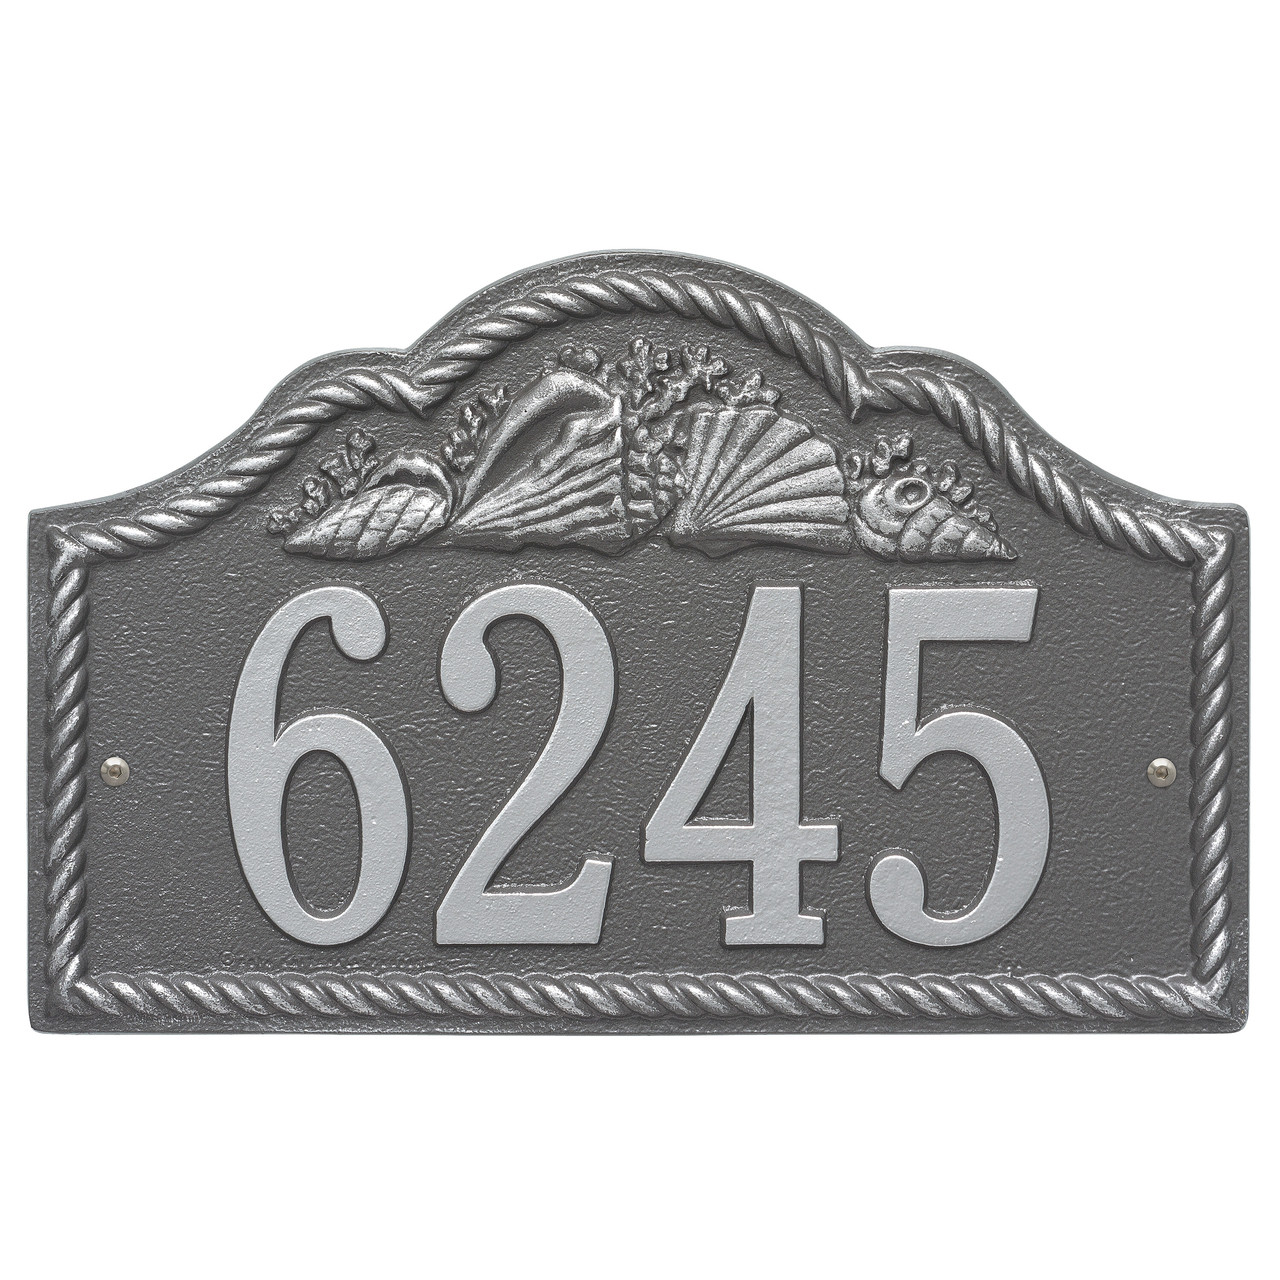 5124PS